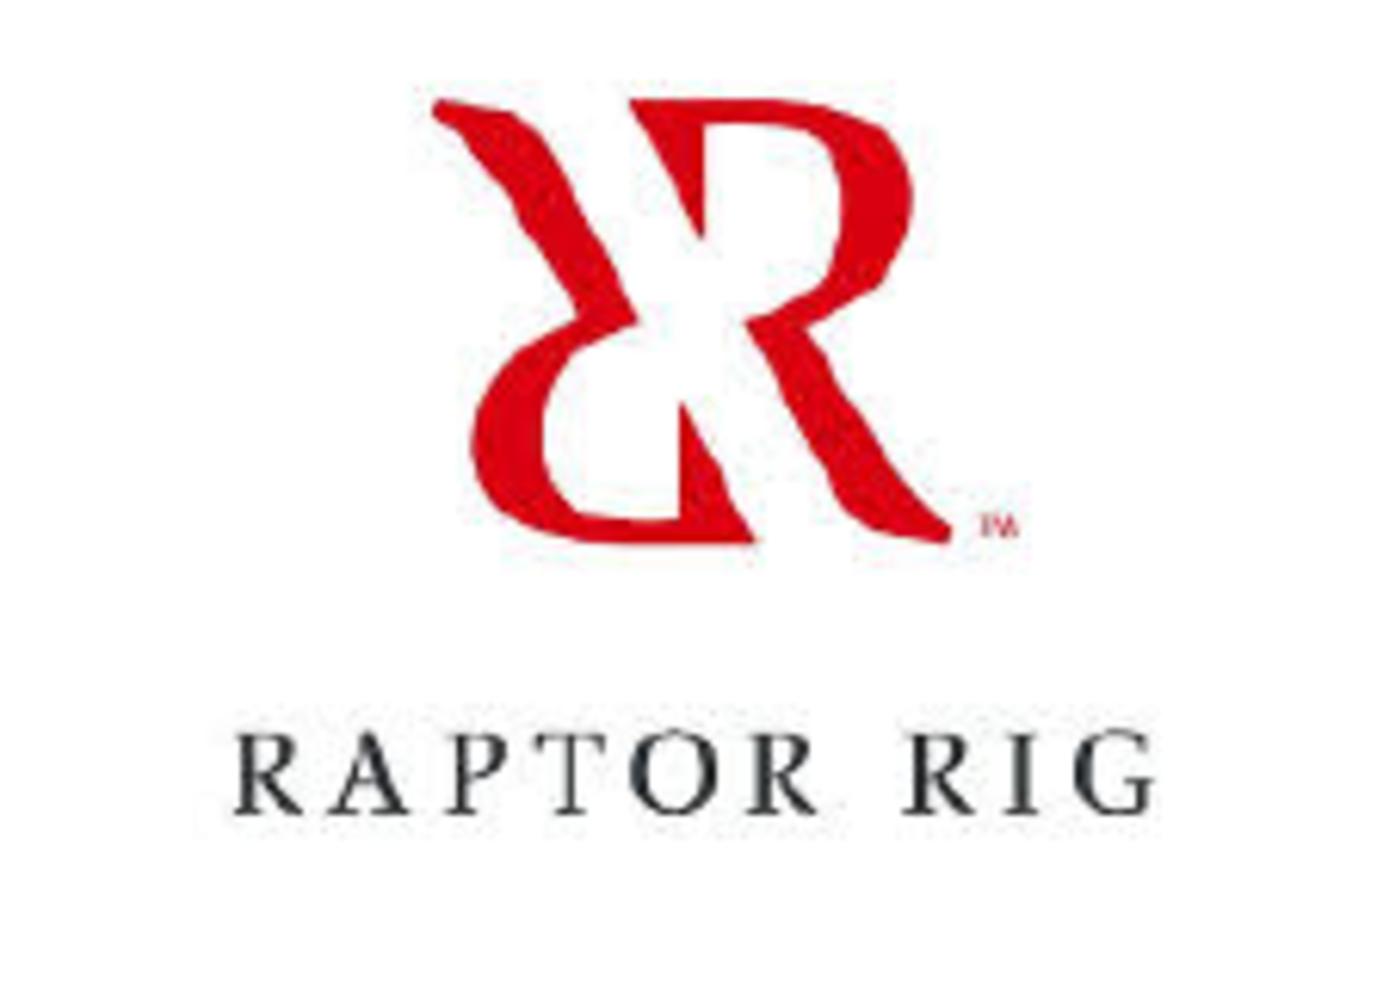 Unreserved Receivership Auction of Raptor Rig Ltd.